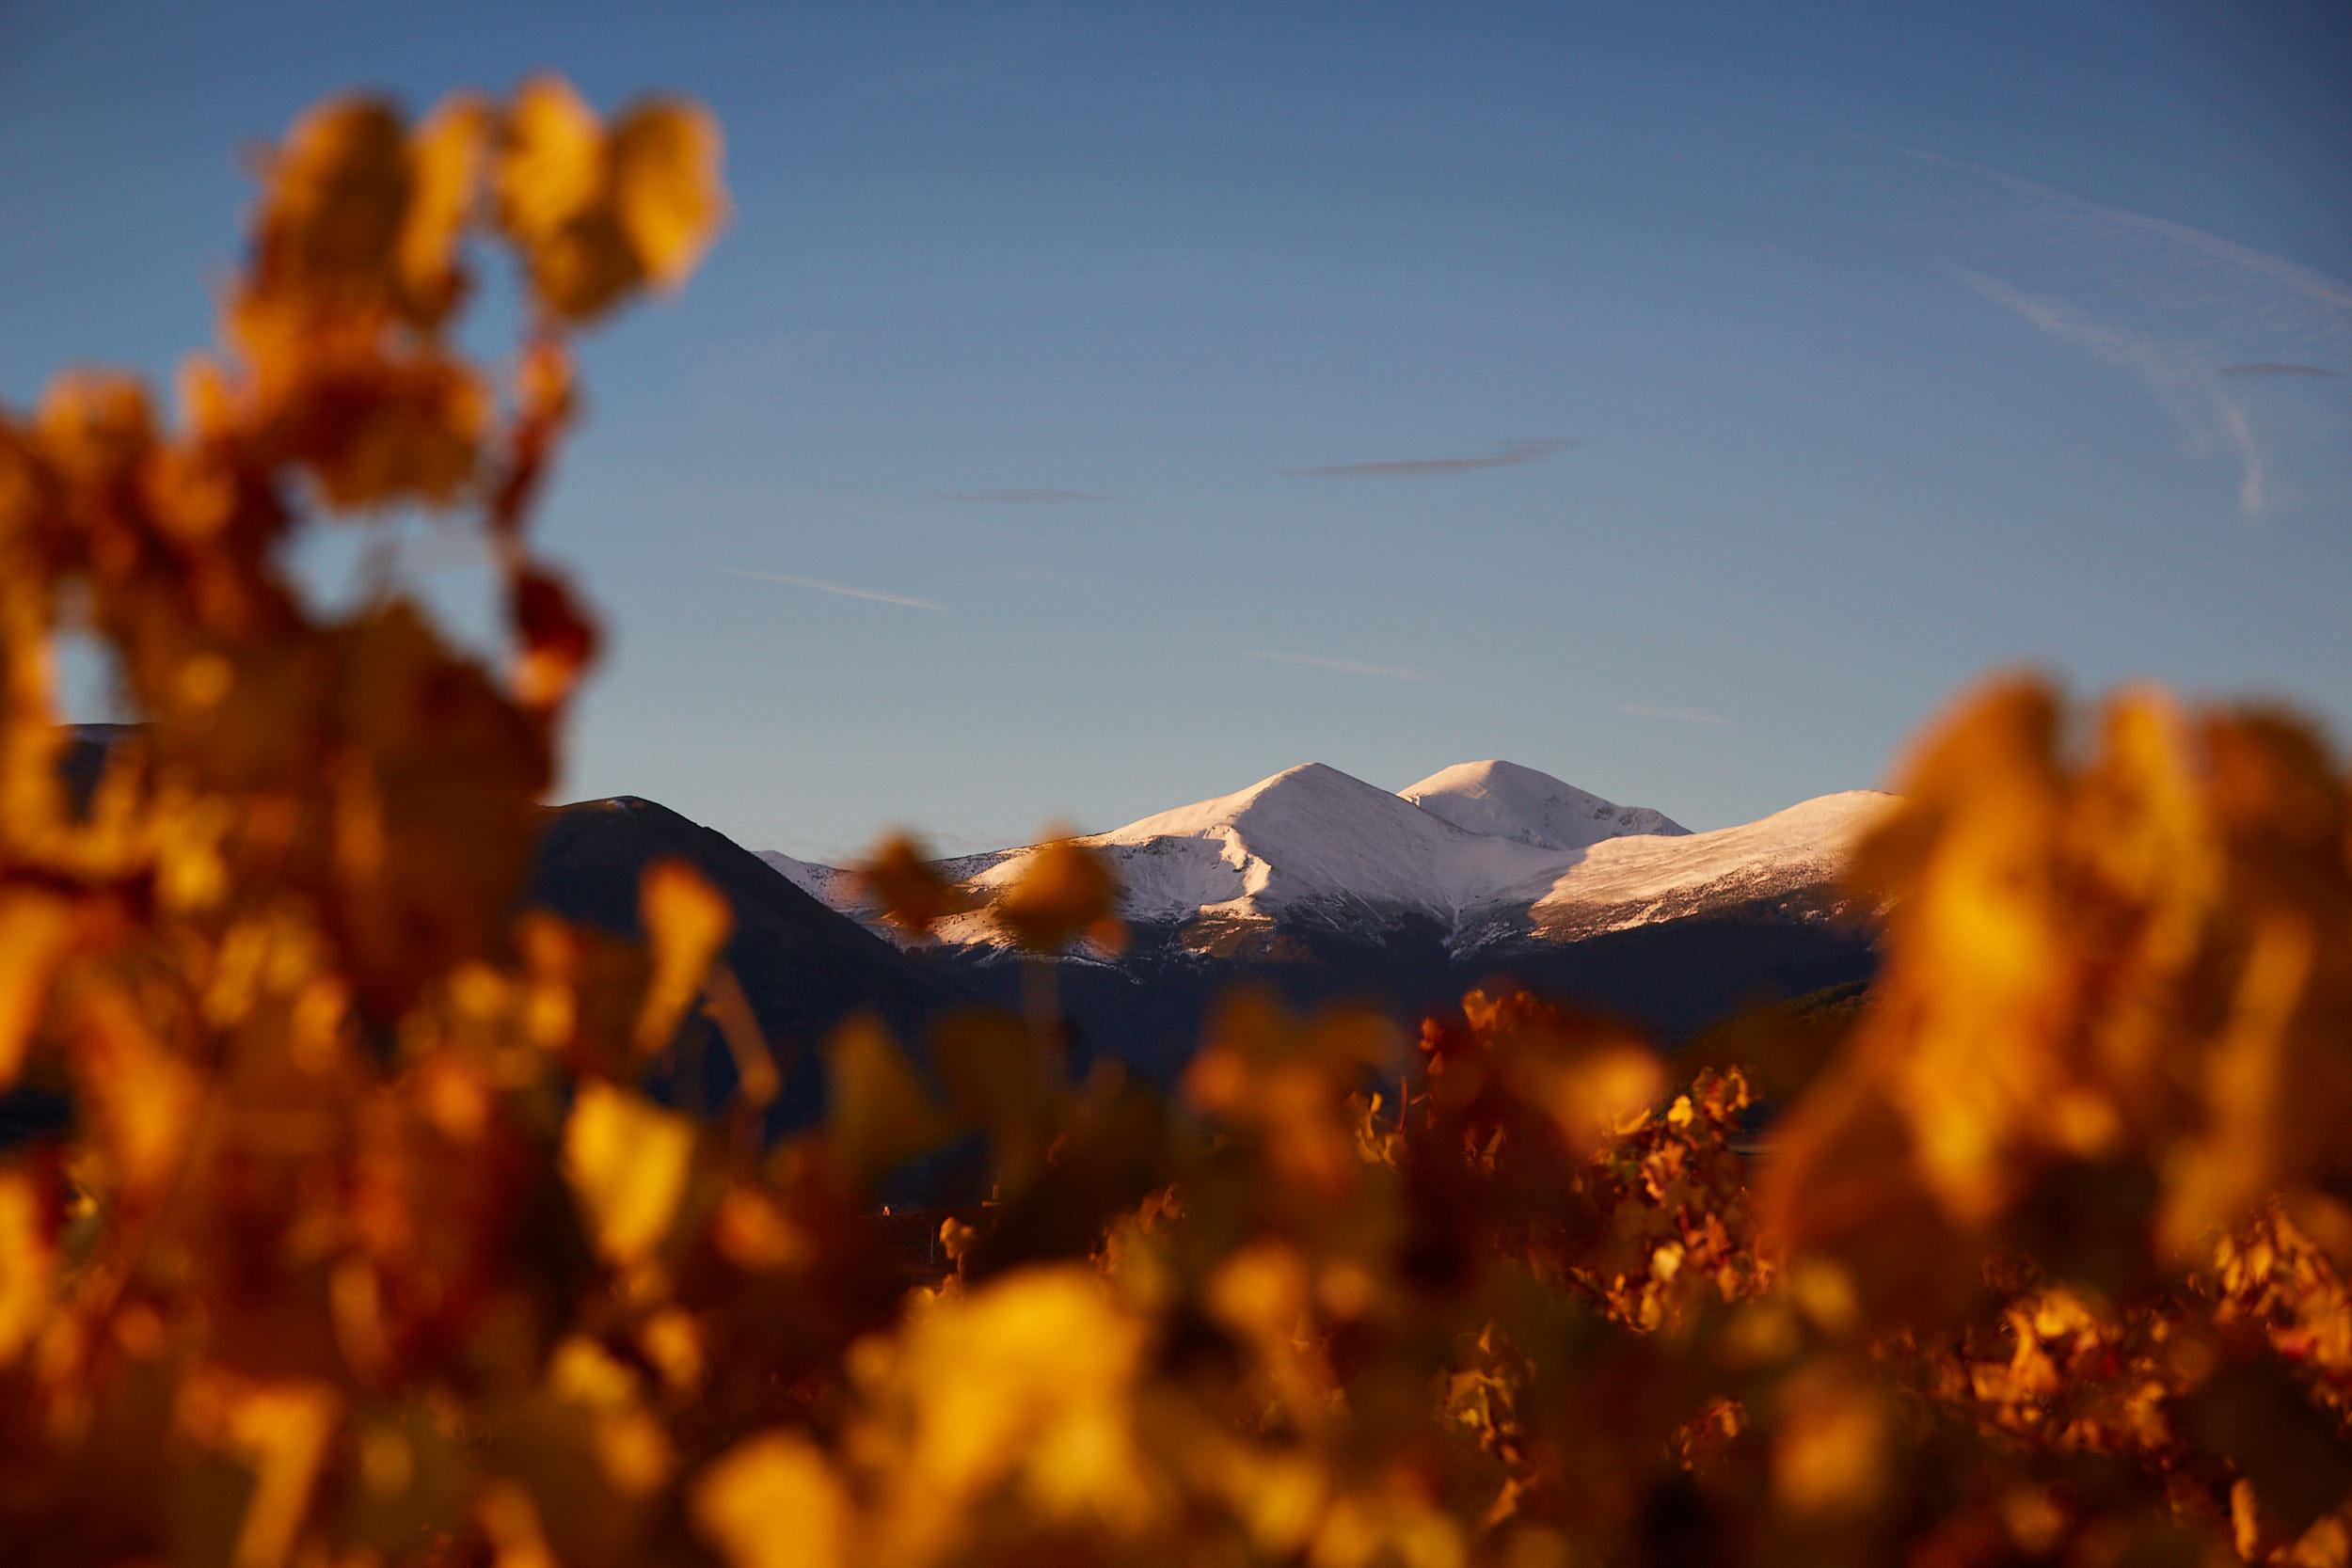 1811fotografia-profesional-corporativa-vino-rioja-espana-James-Sturcke_0047.jpg